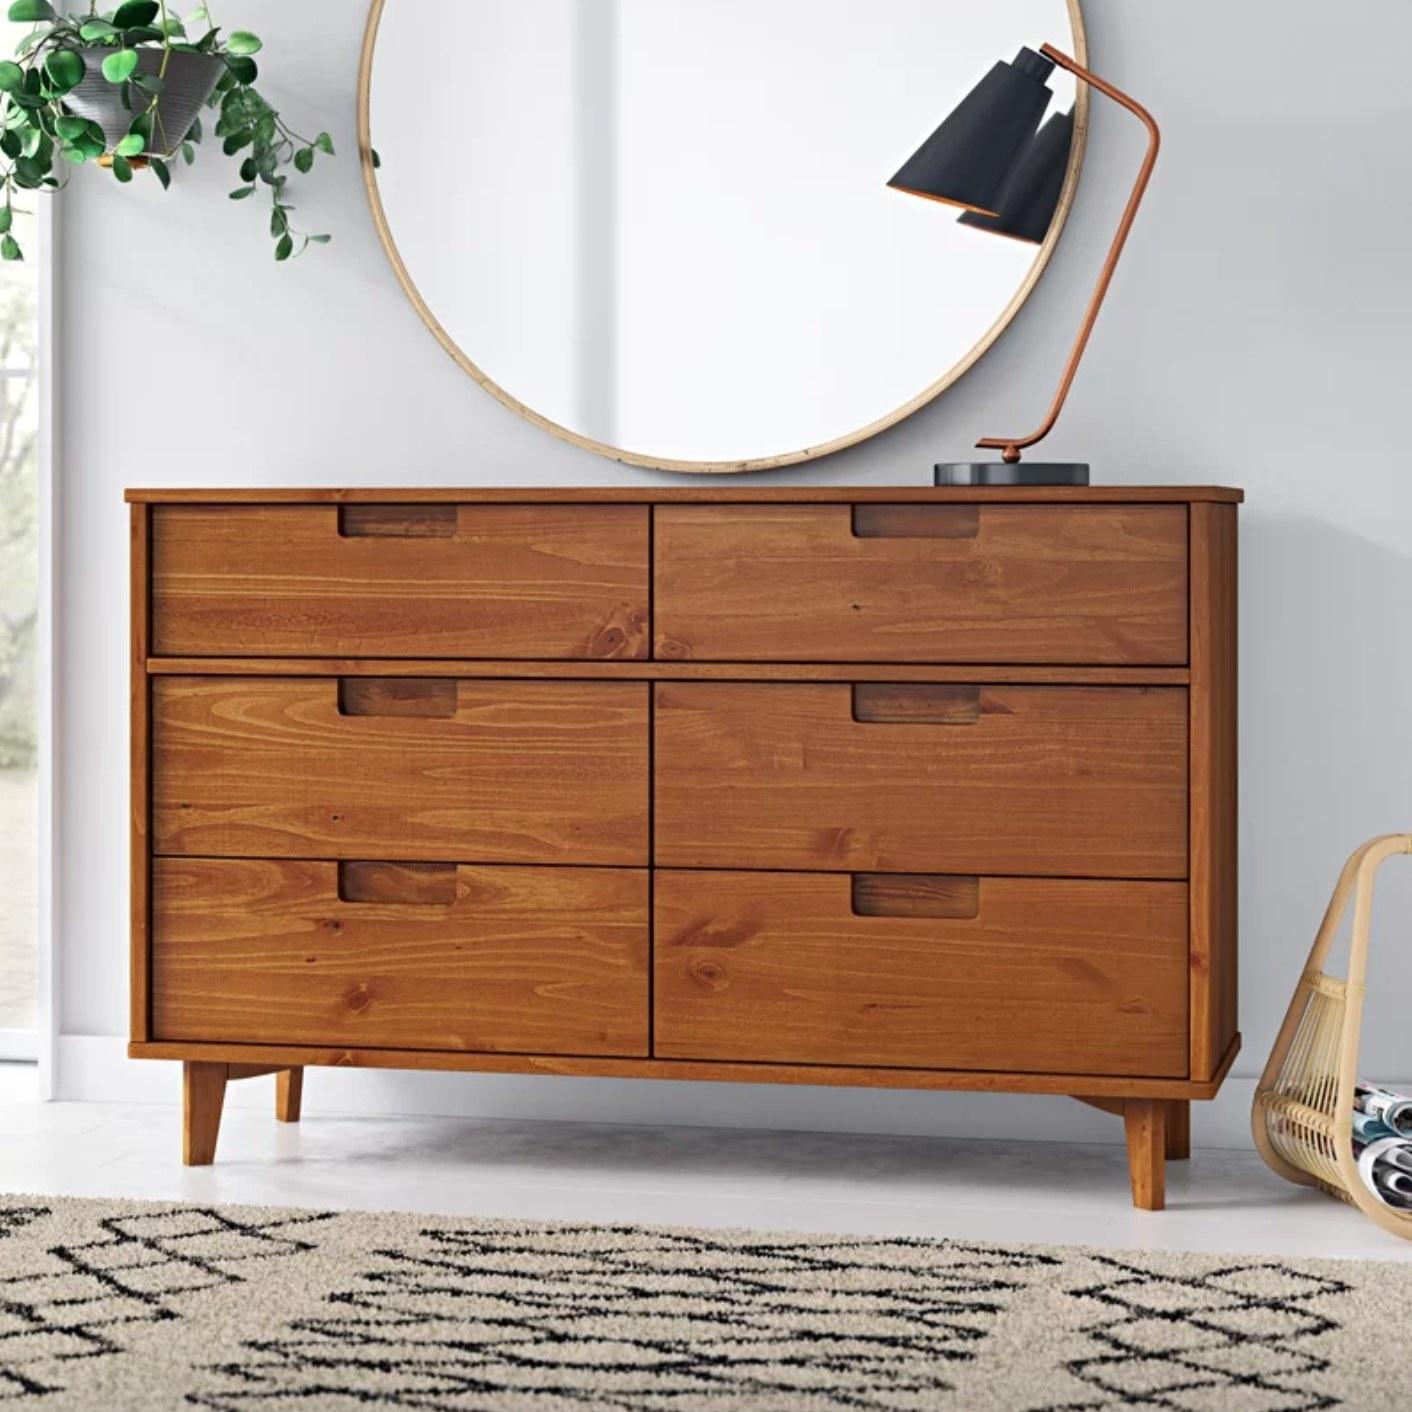 The six drawer dresser in caramel